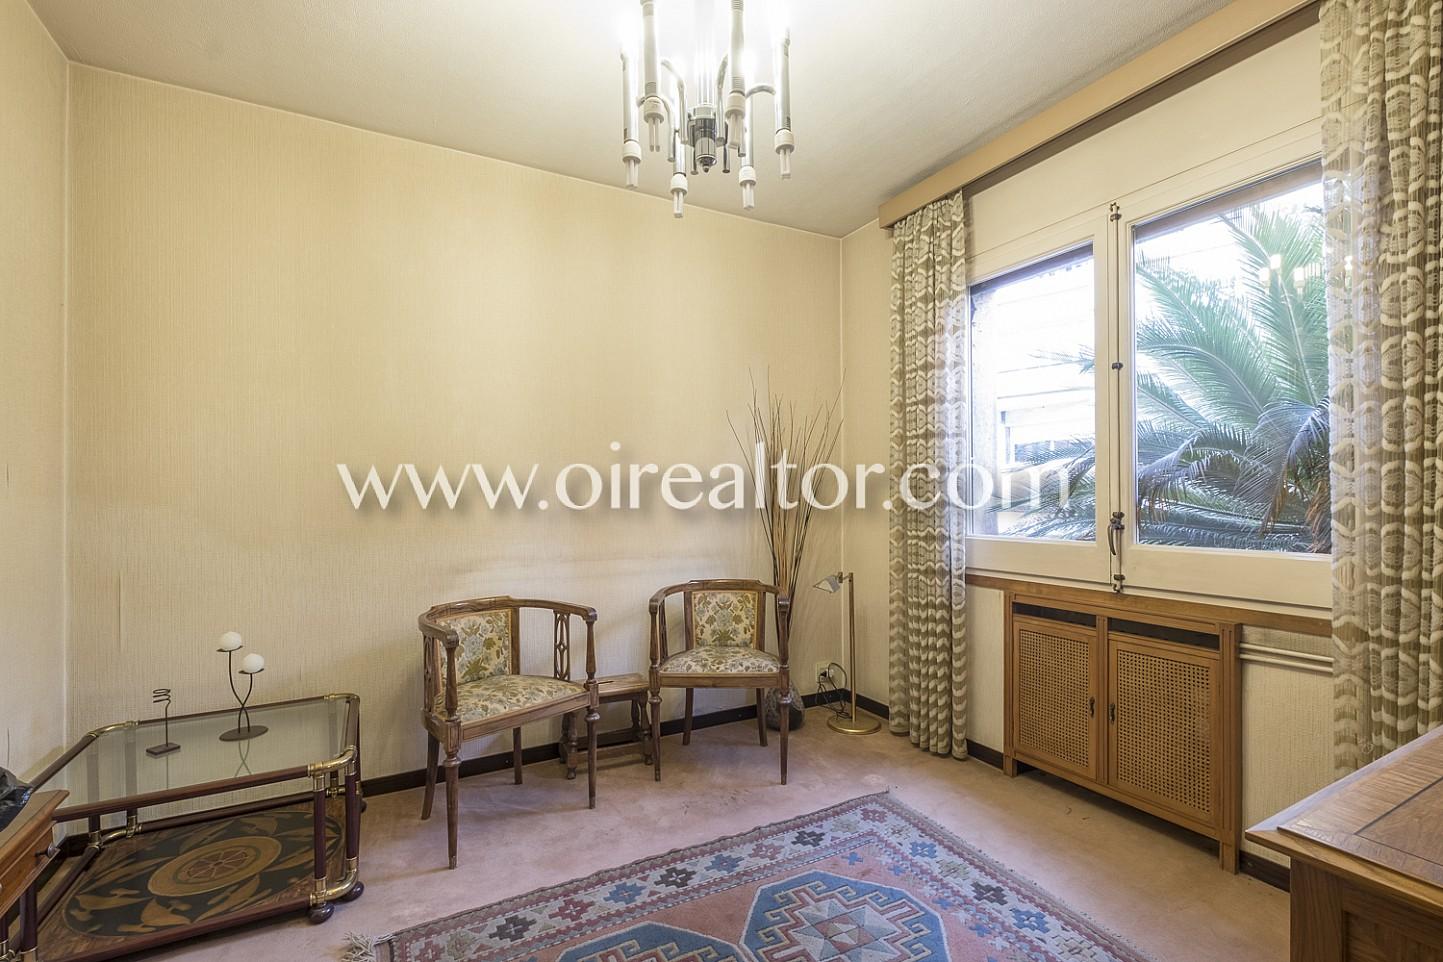 habitación, salón, sala de estar, luminoso, sillas, mesa,